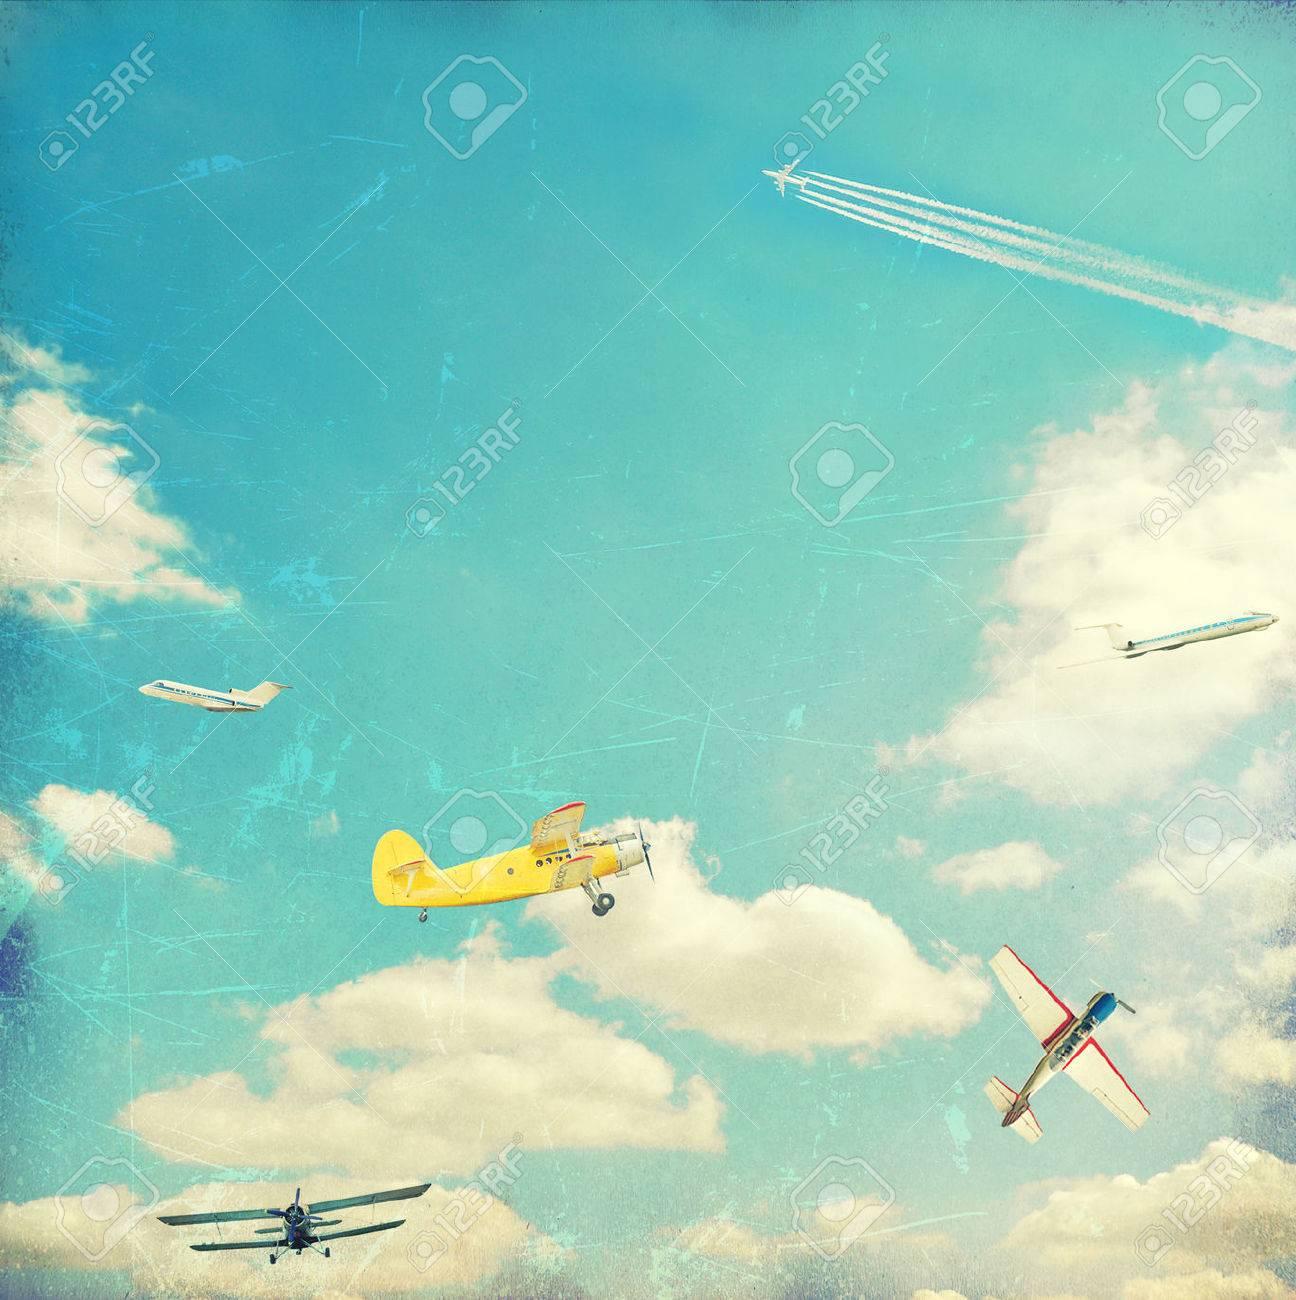 Aviation vintage background - 23054355